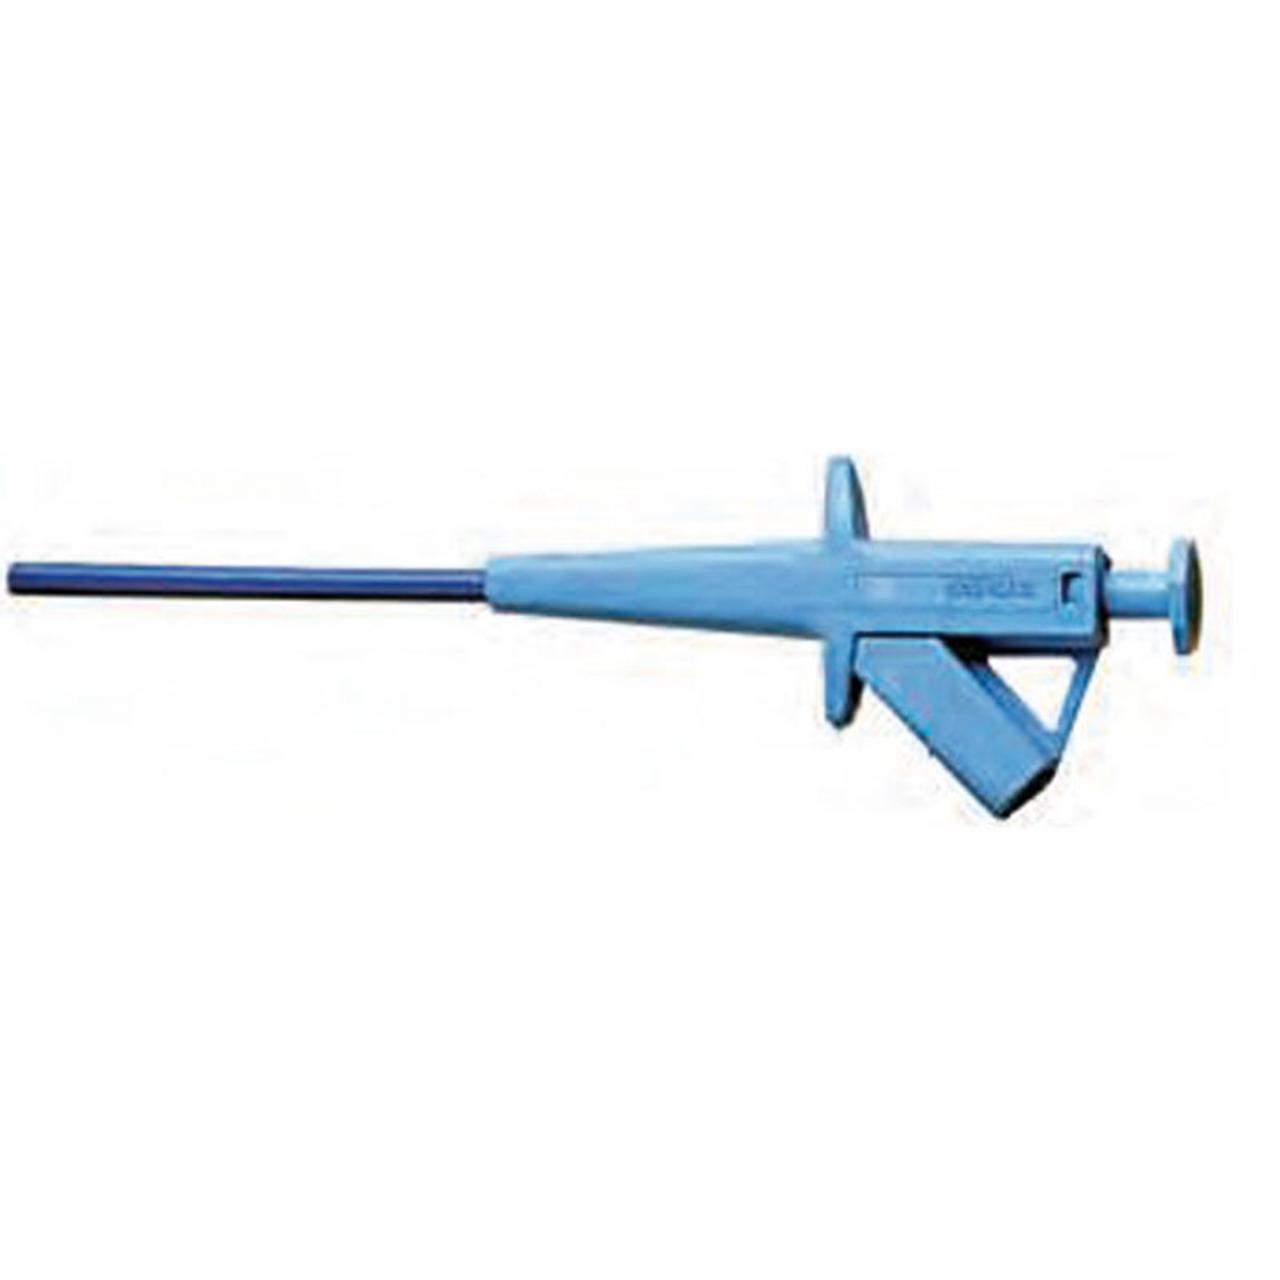 Sicherheits-Klammergreifer SKPS-4- blau- 4 mm